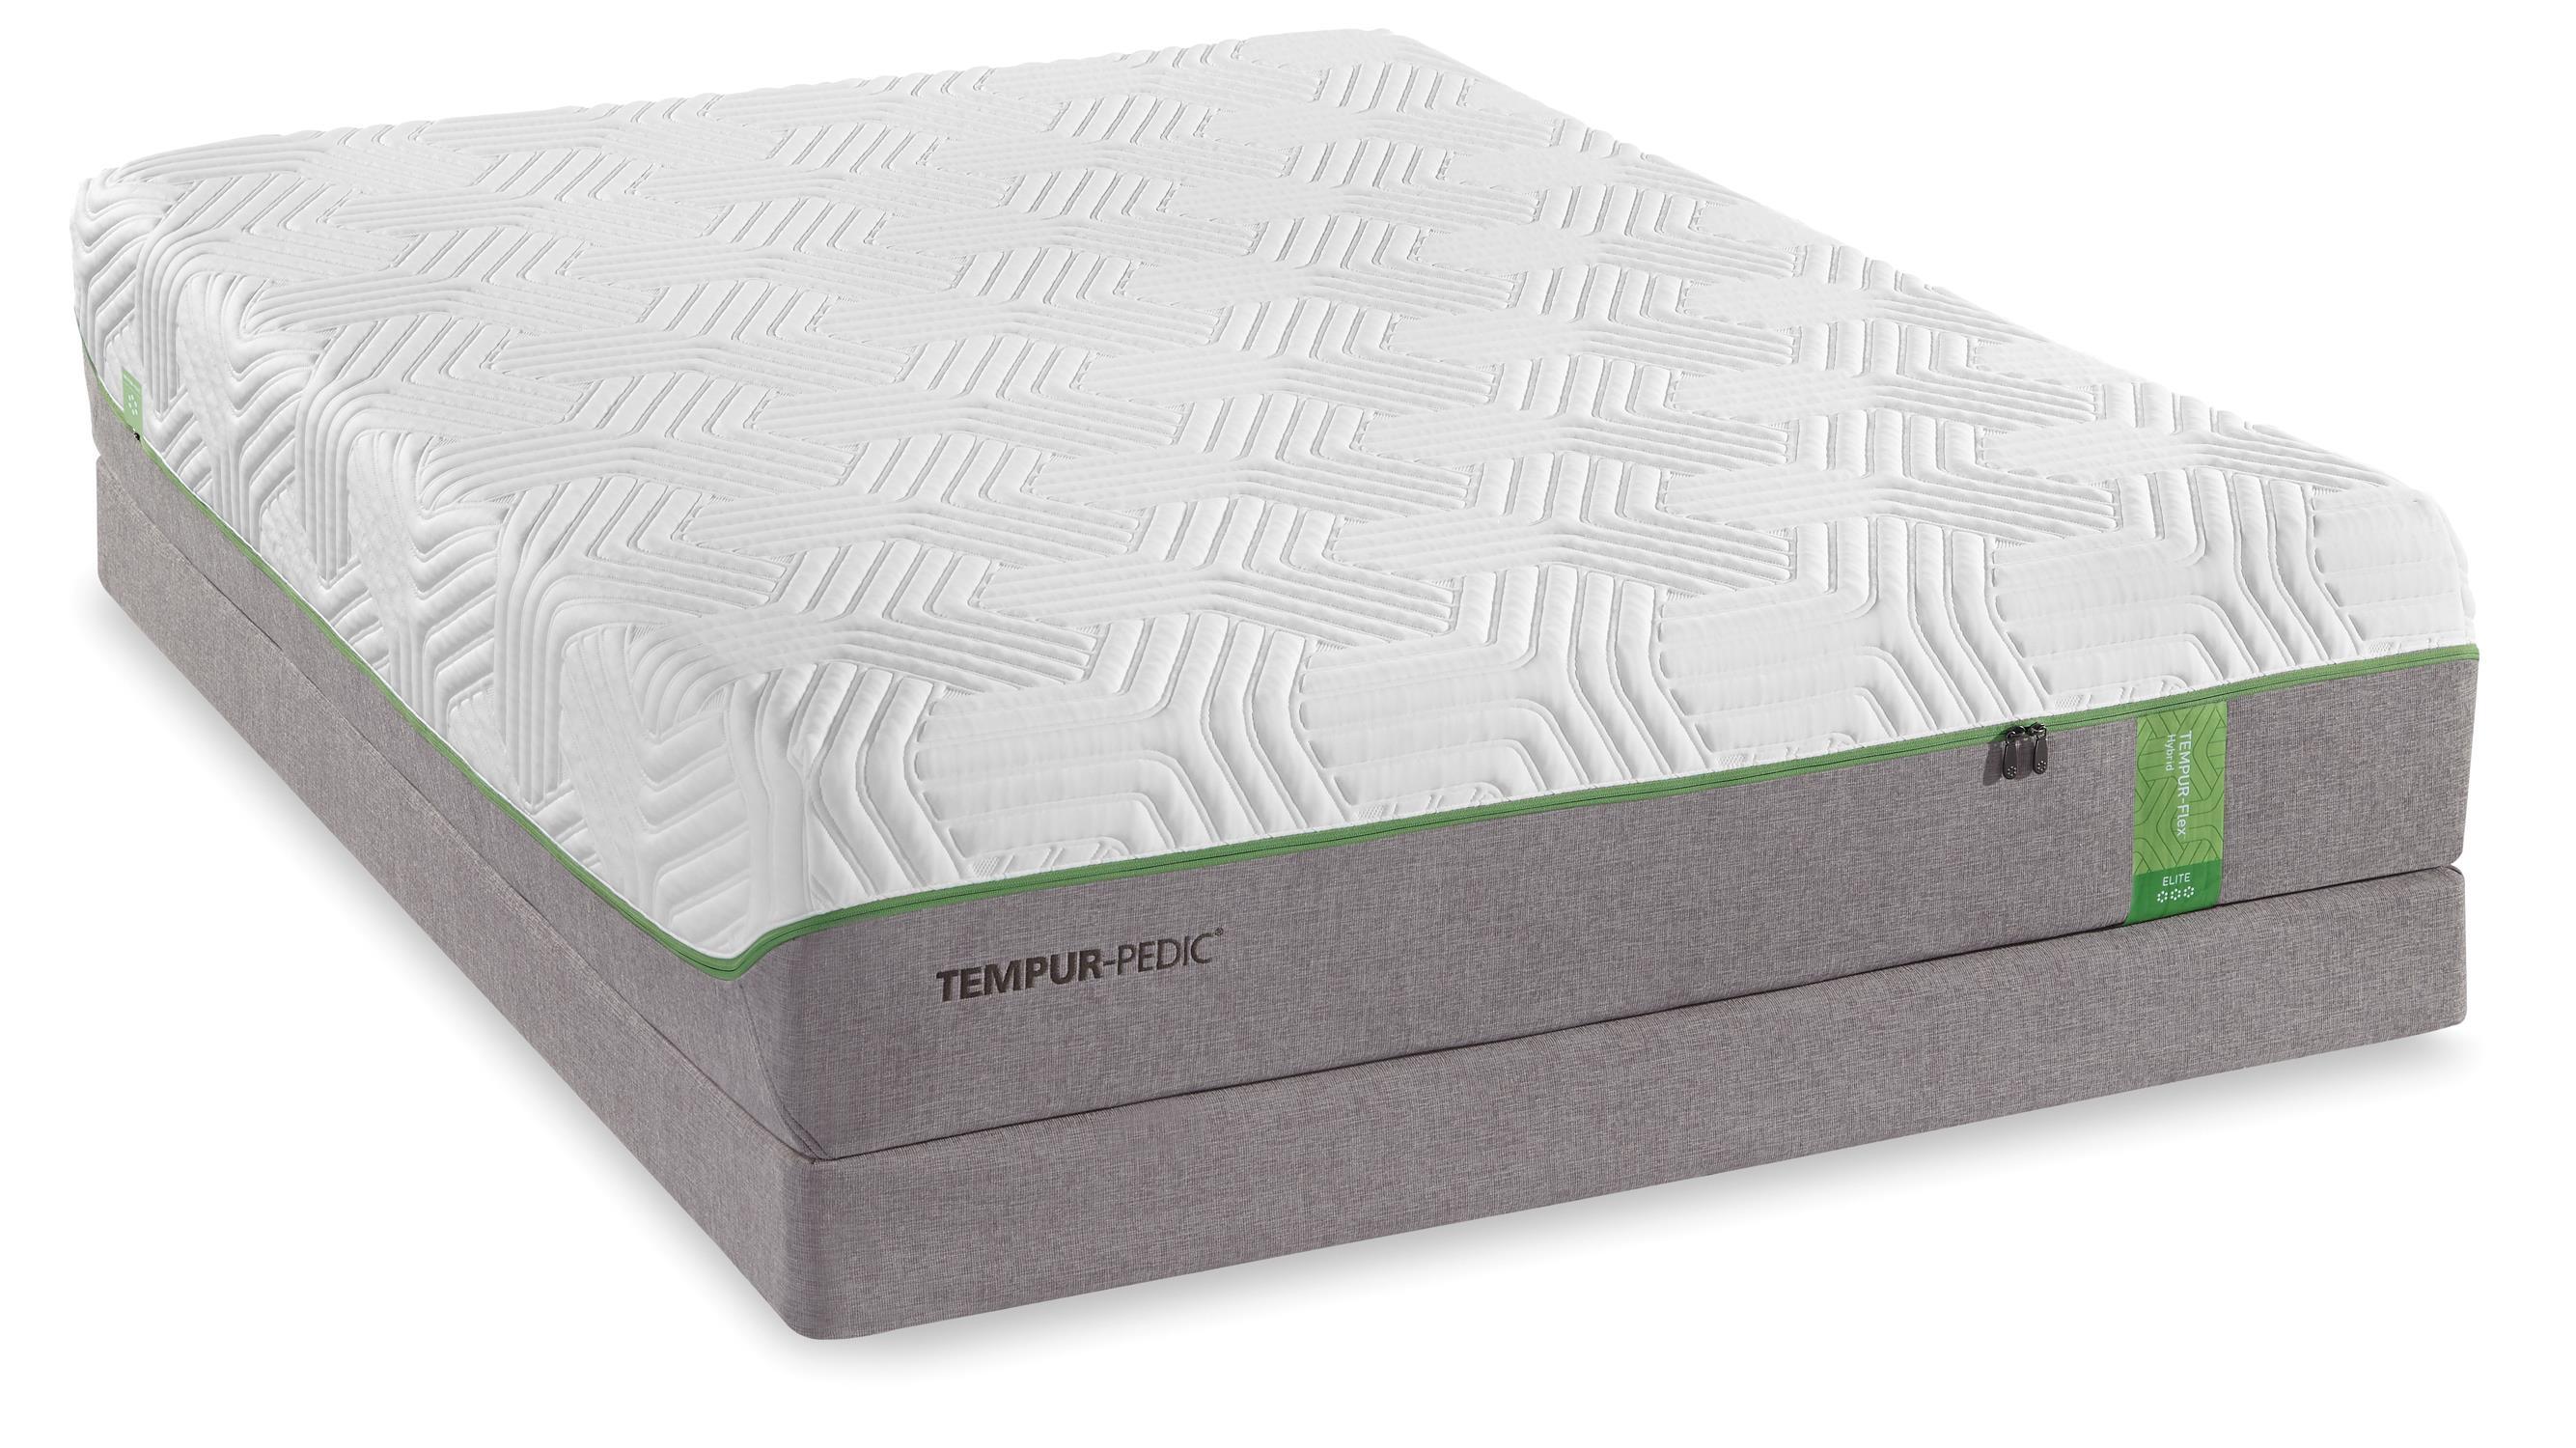 Tempur-Pedic® TEMPUR-Flex Elite Cal King Medium Soft Plush Mattress Set - Item Number: 10117180+2x20510190